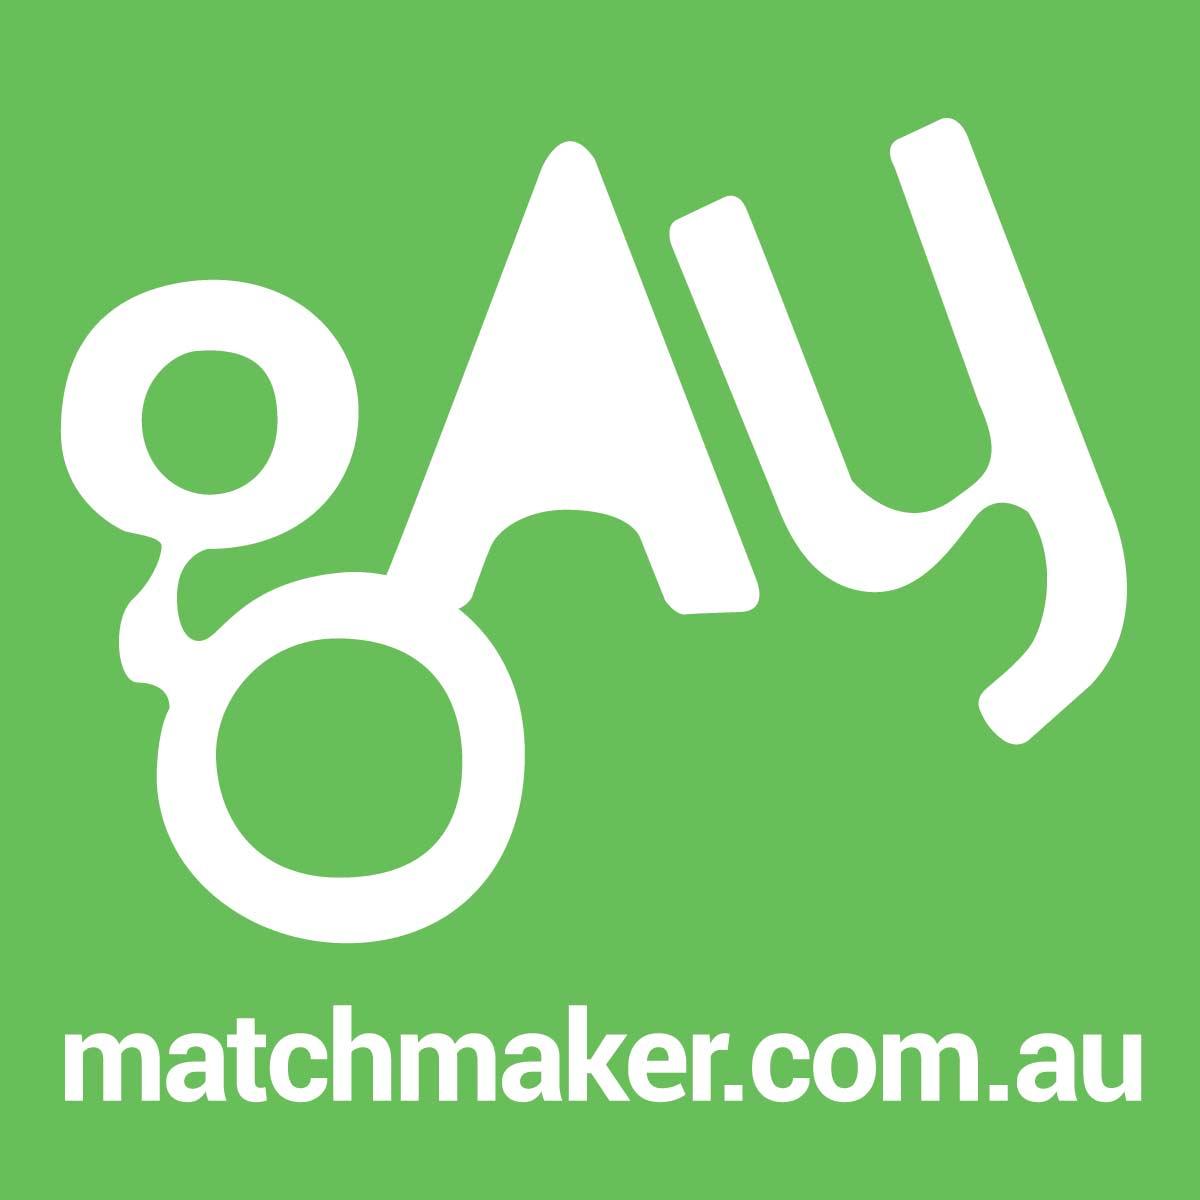 gaymatchmaker_1200x1200